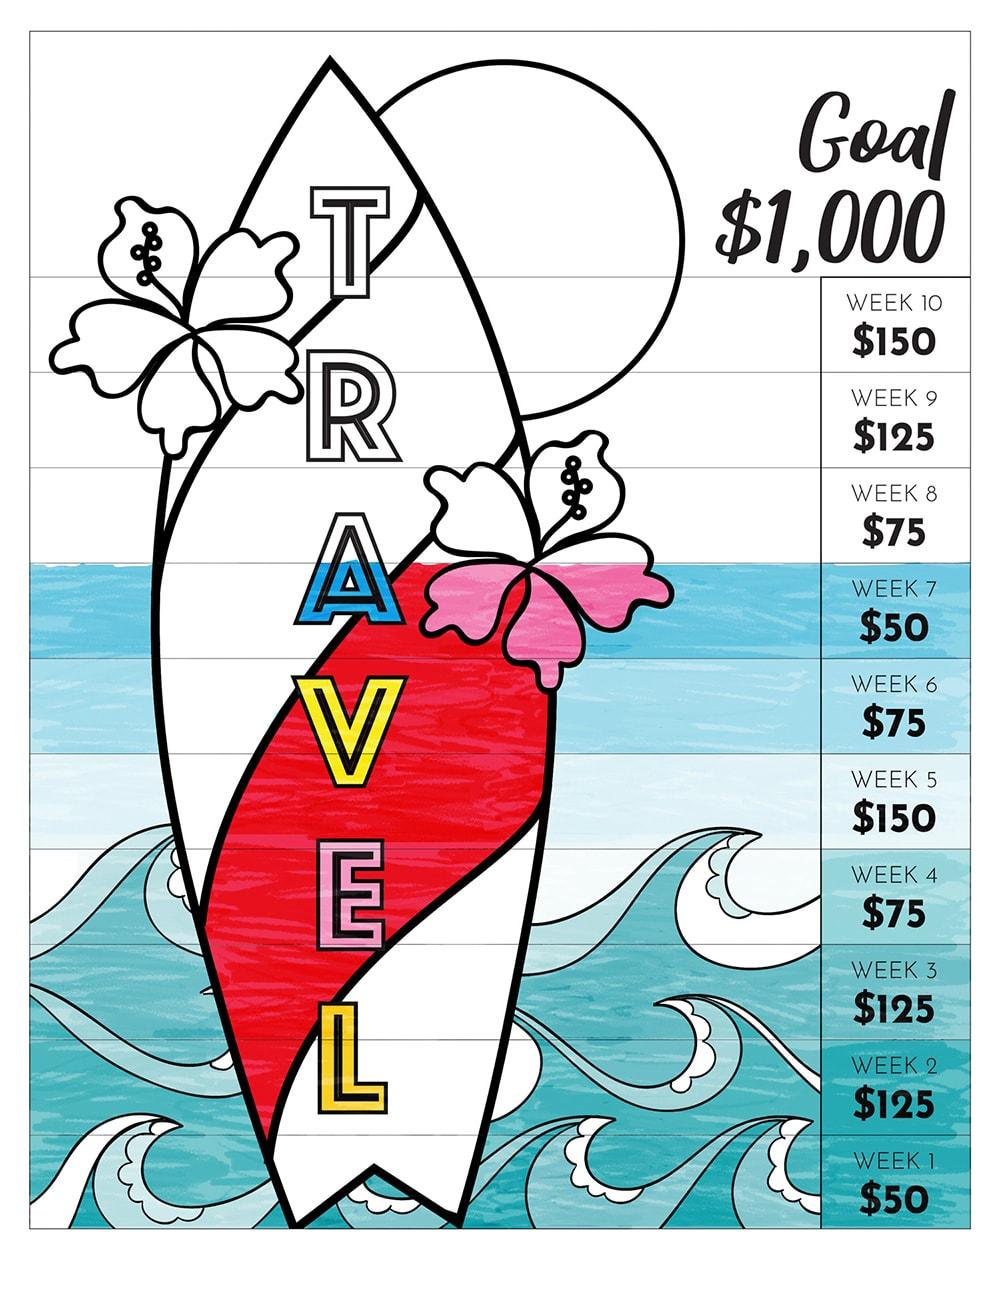 Travel savings plan: save $1000 in 10 weeks with this cute savings plan!